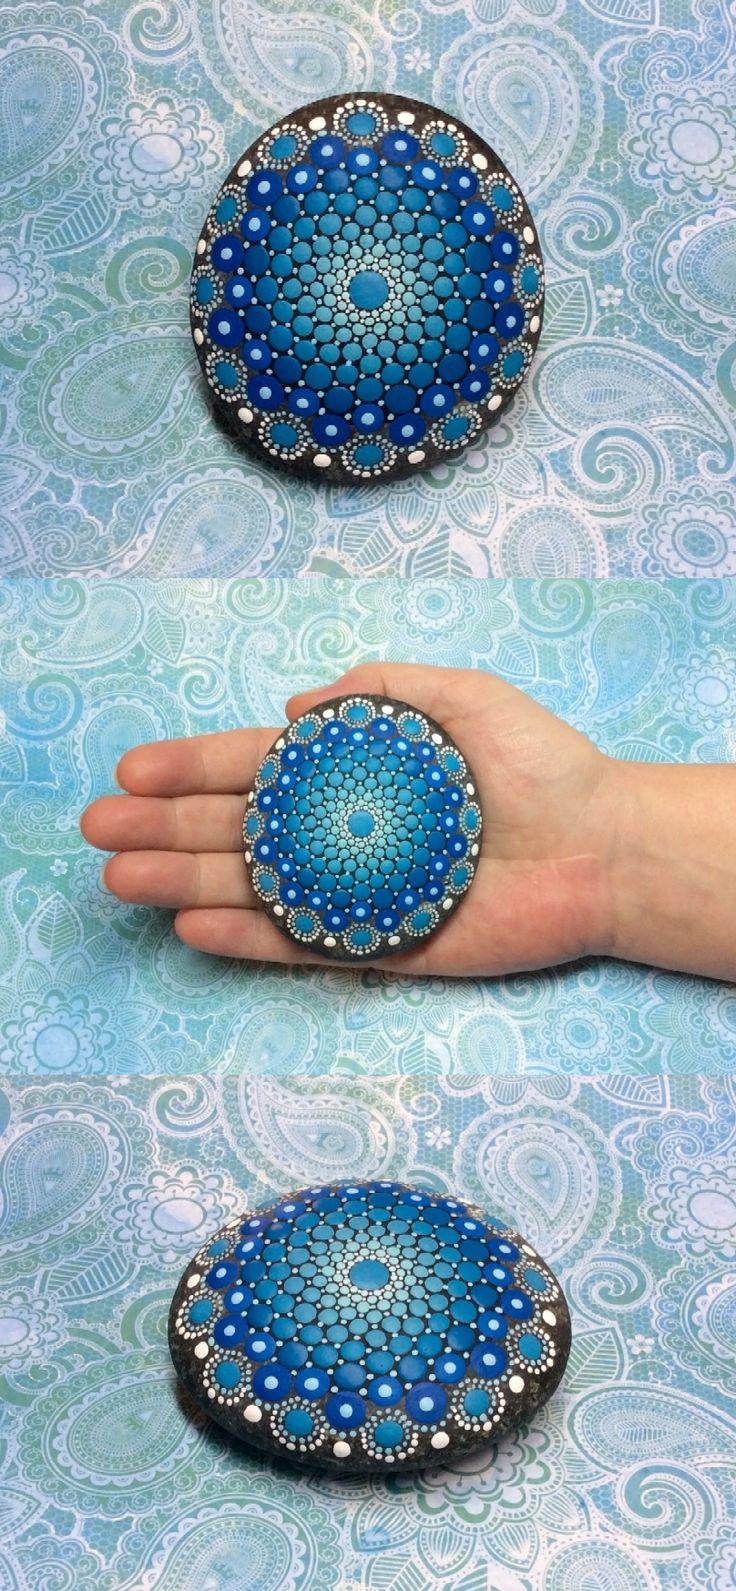 510 best mandala stones images on Pinterest | Painted rocks, Rock ...